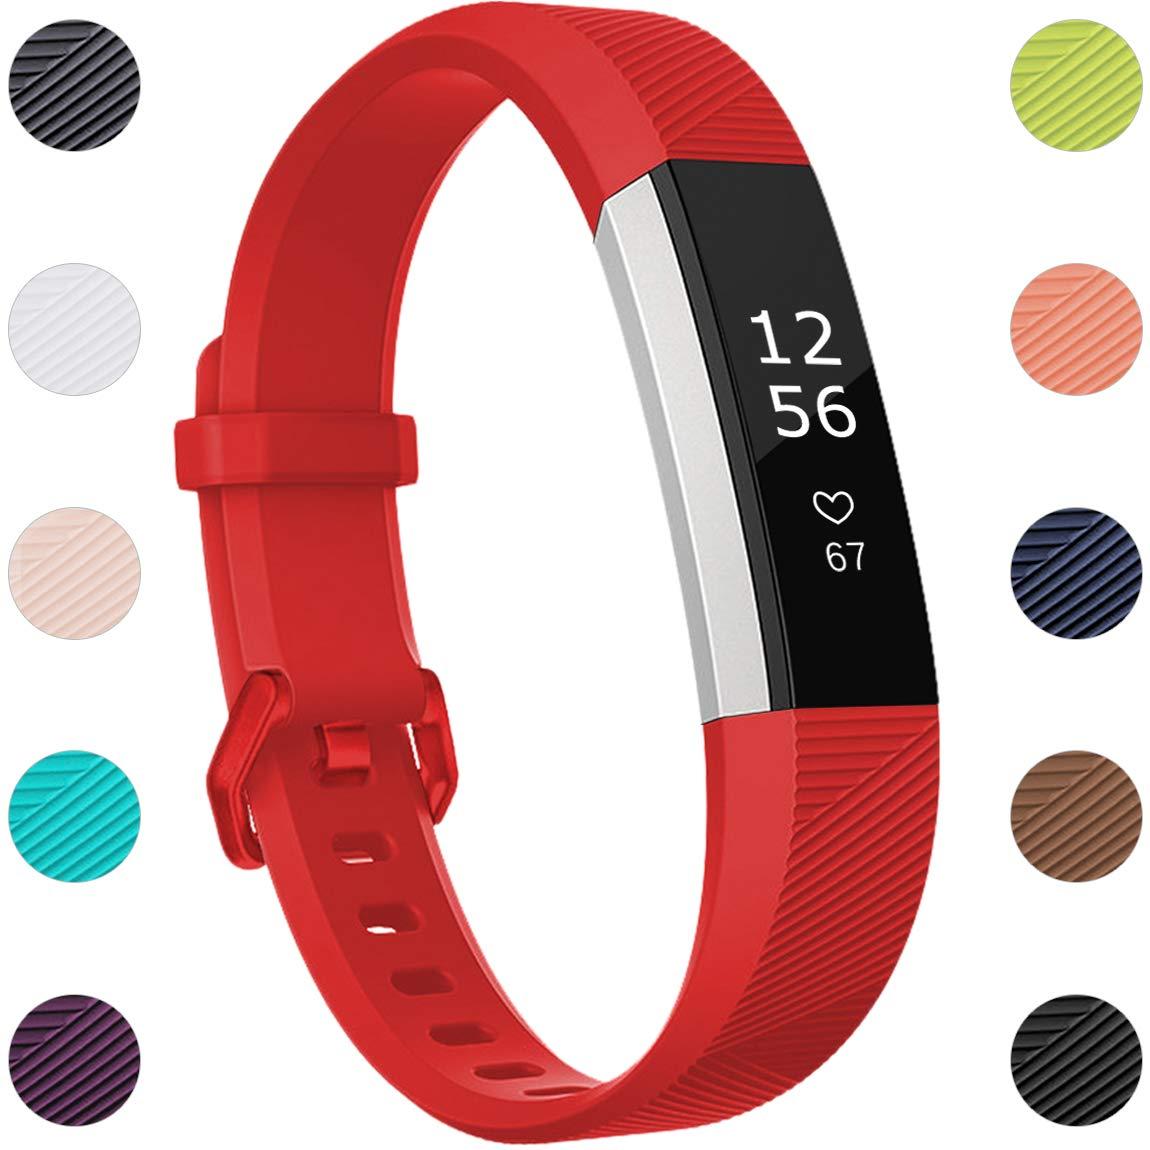 Malla Para Reloj Fitbit Alta / Fitbit Alta Hr / Ace (roja)